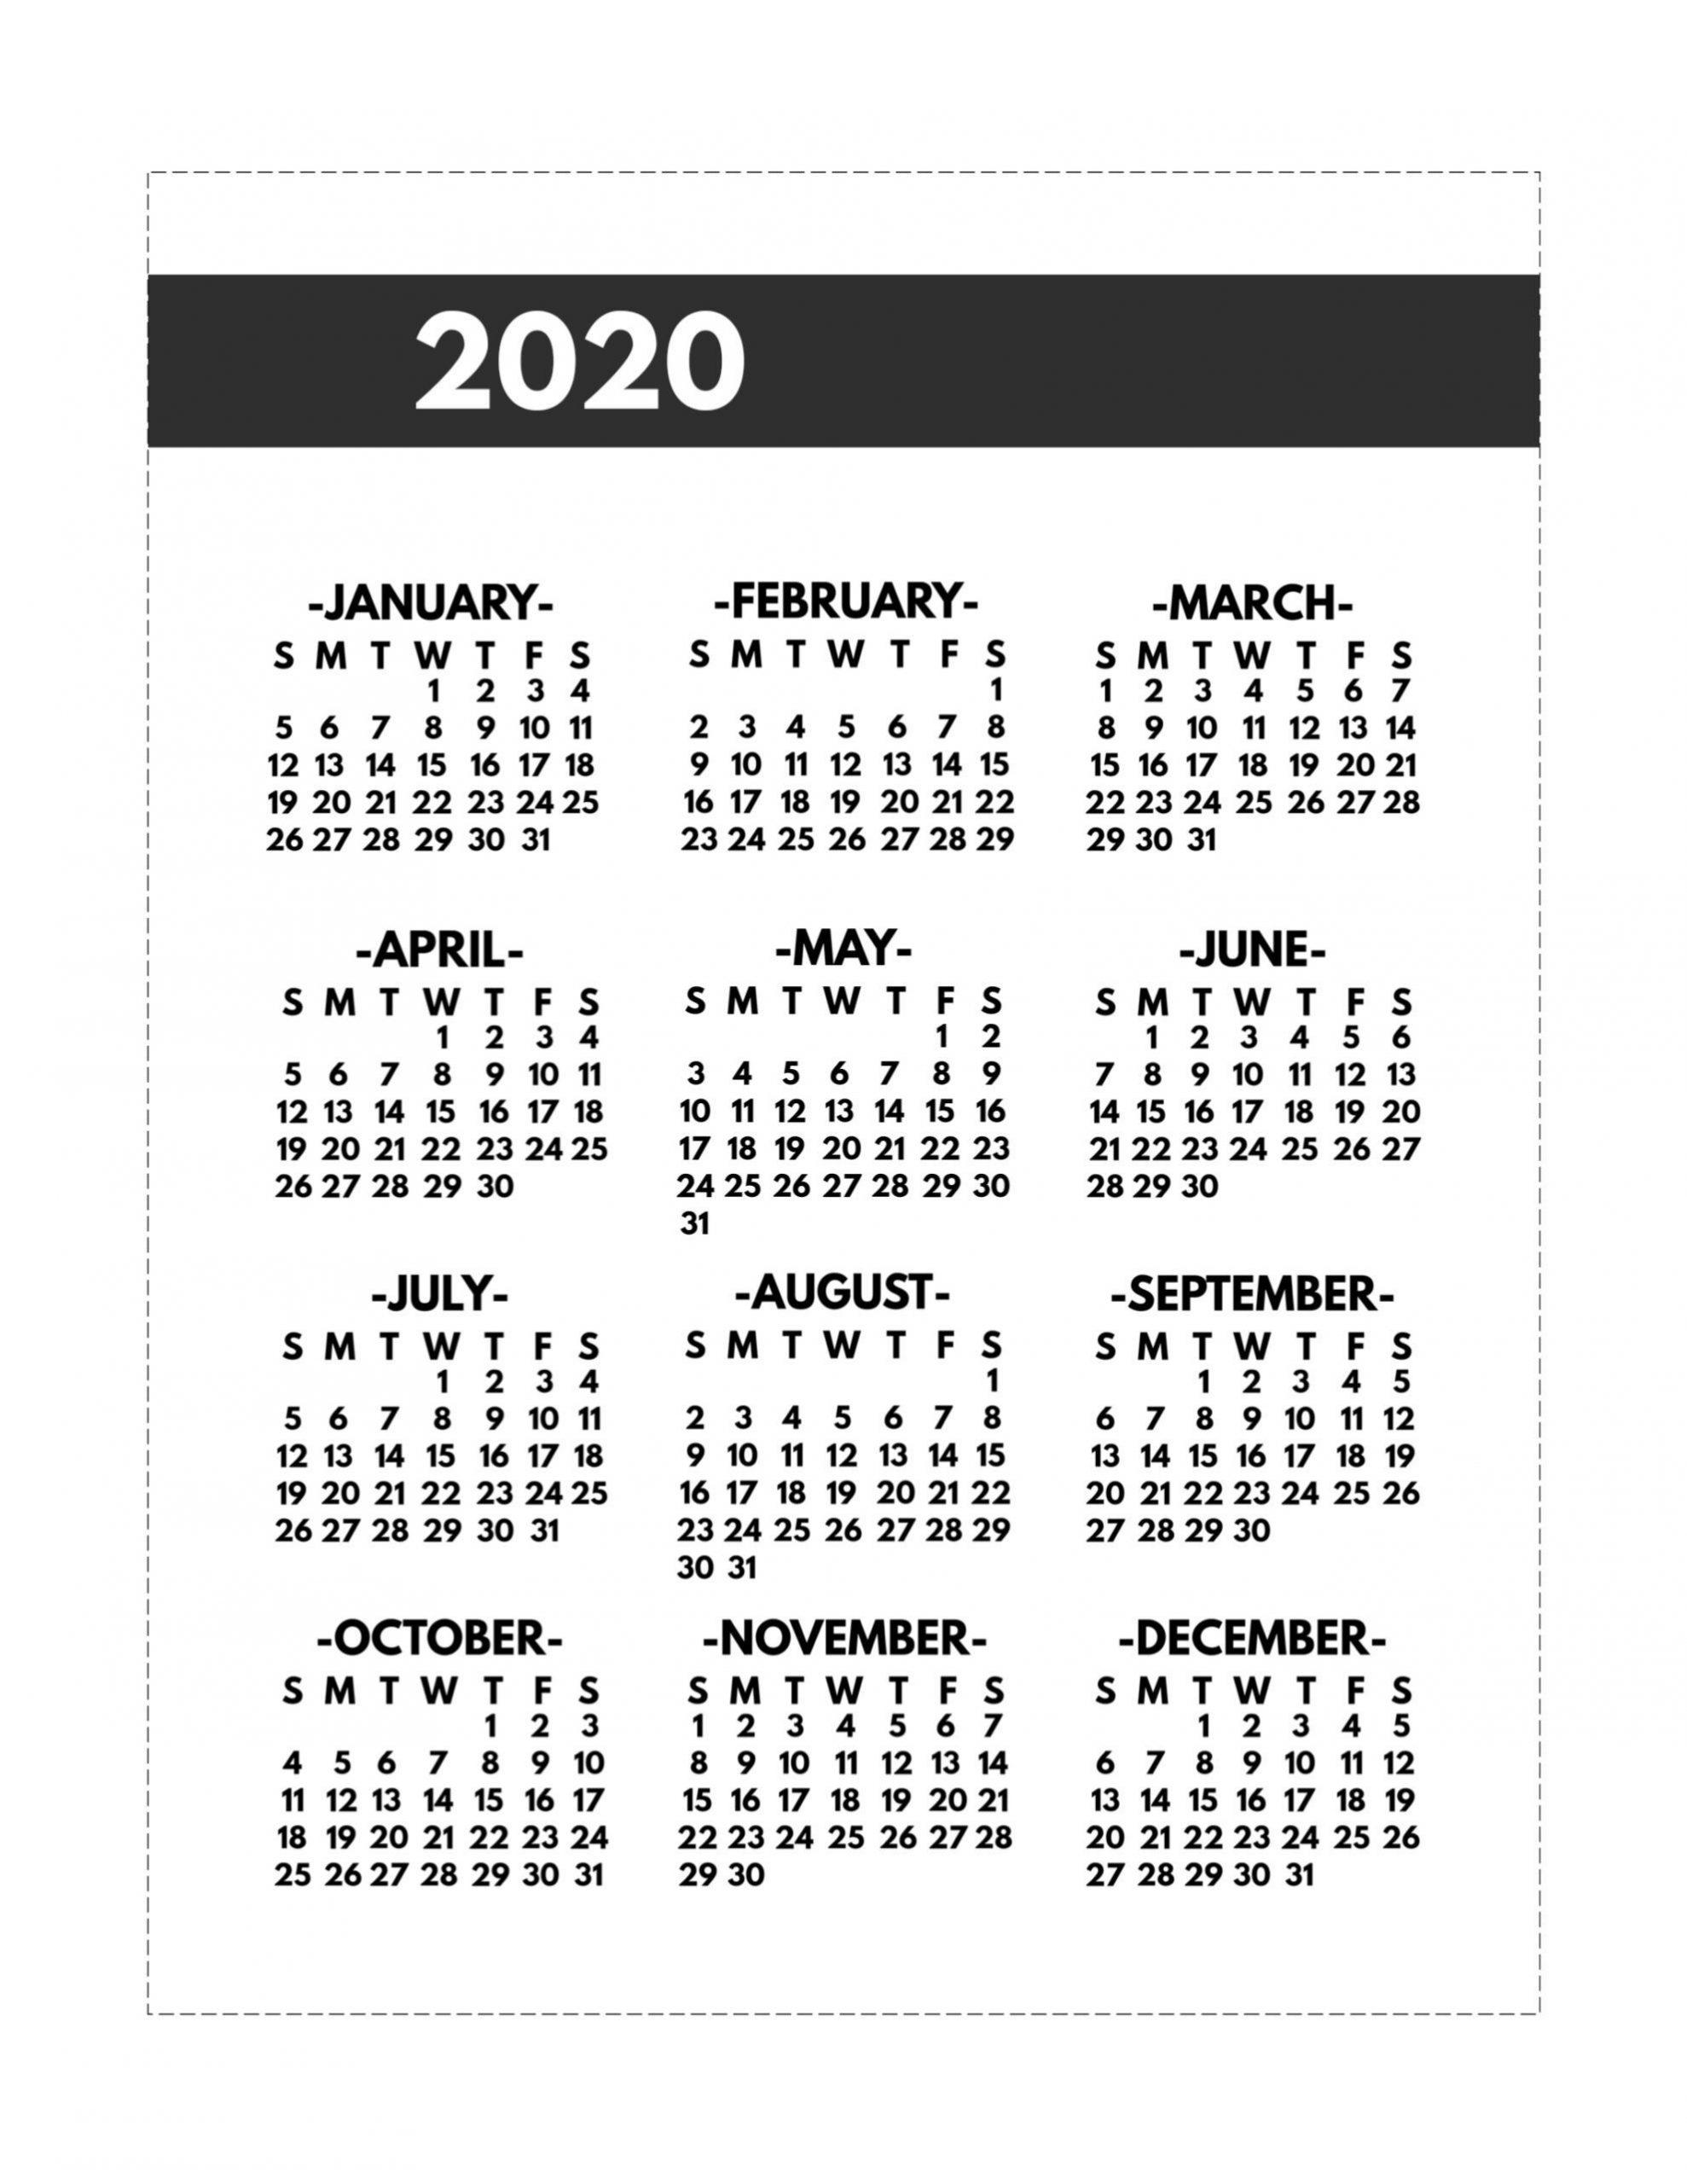 Free Free Printable 8 X 11 May Calendar In 2020 | Calendar